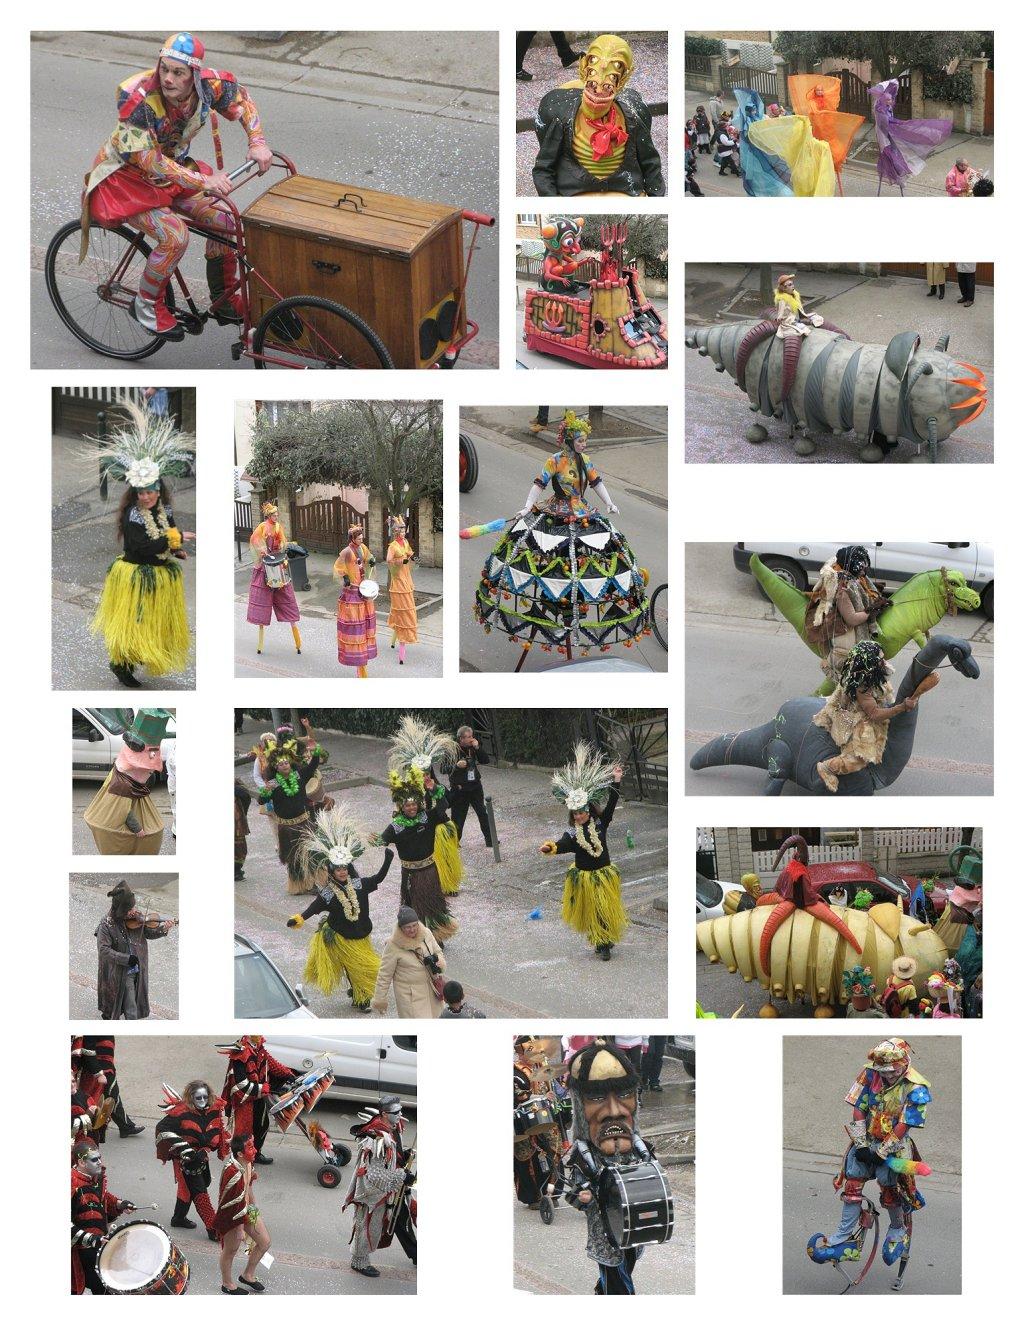 carnaval2010.jpg